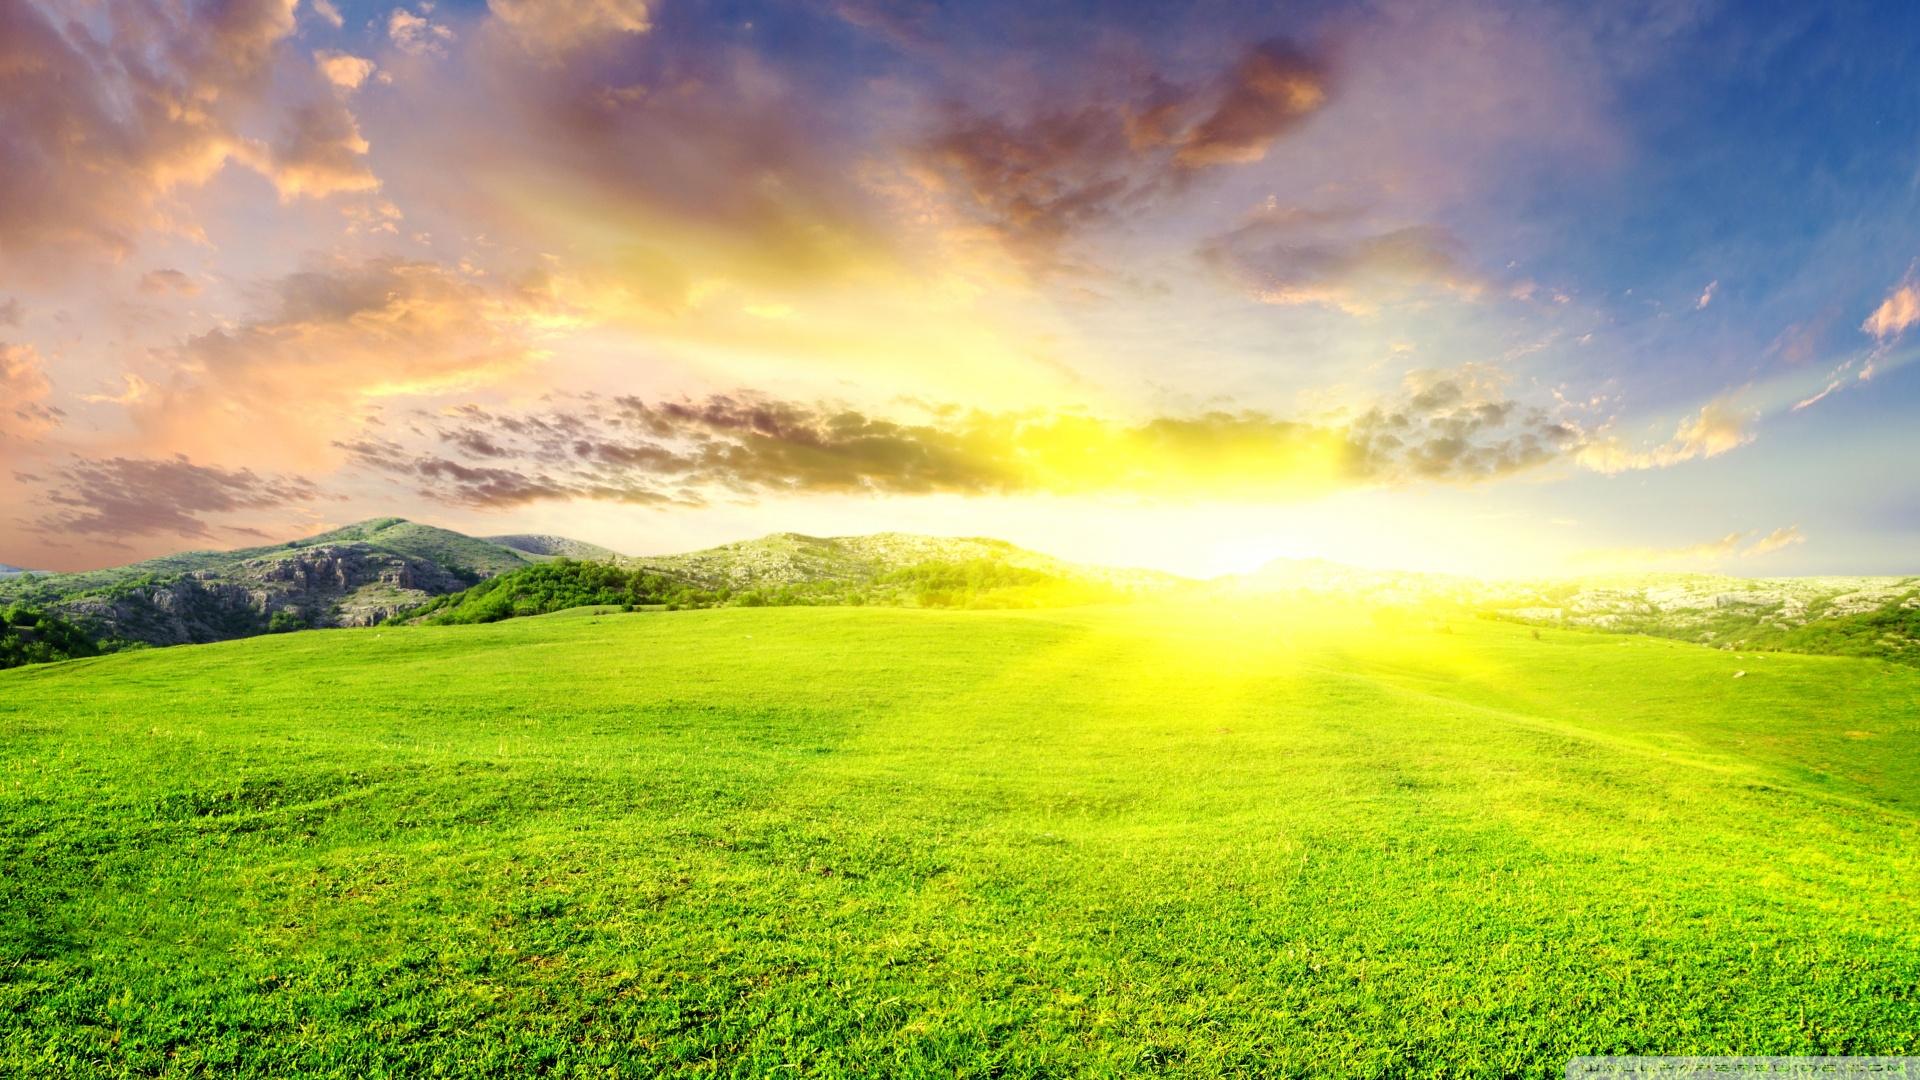 dazzling_sun-wallpaper-1920x1080